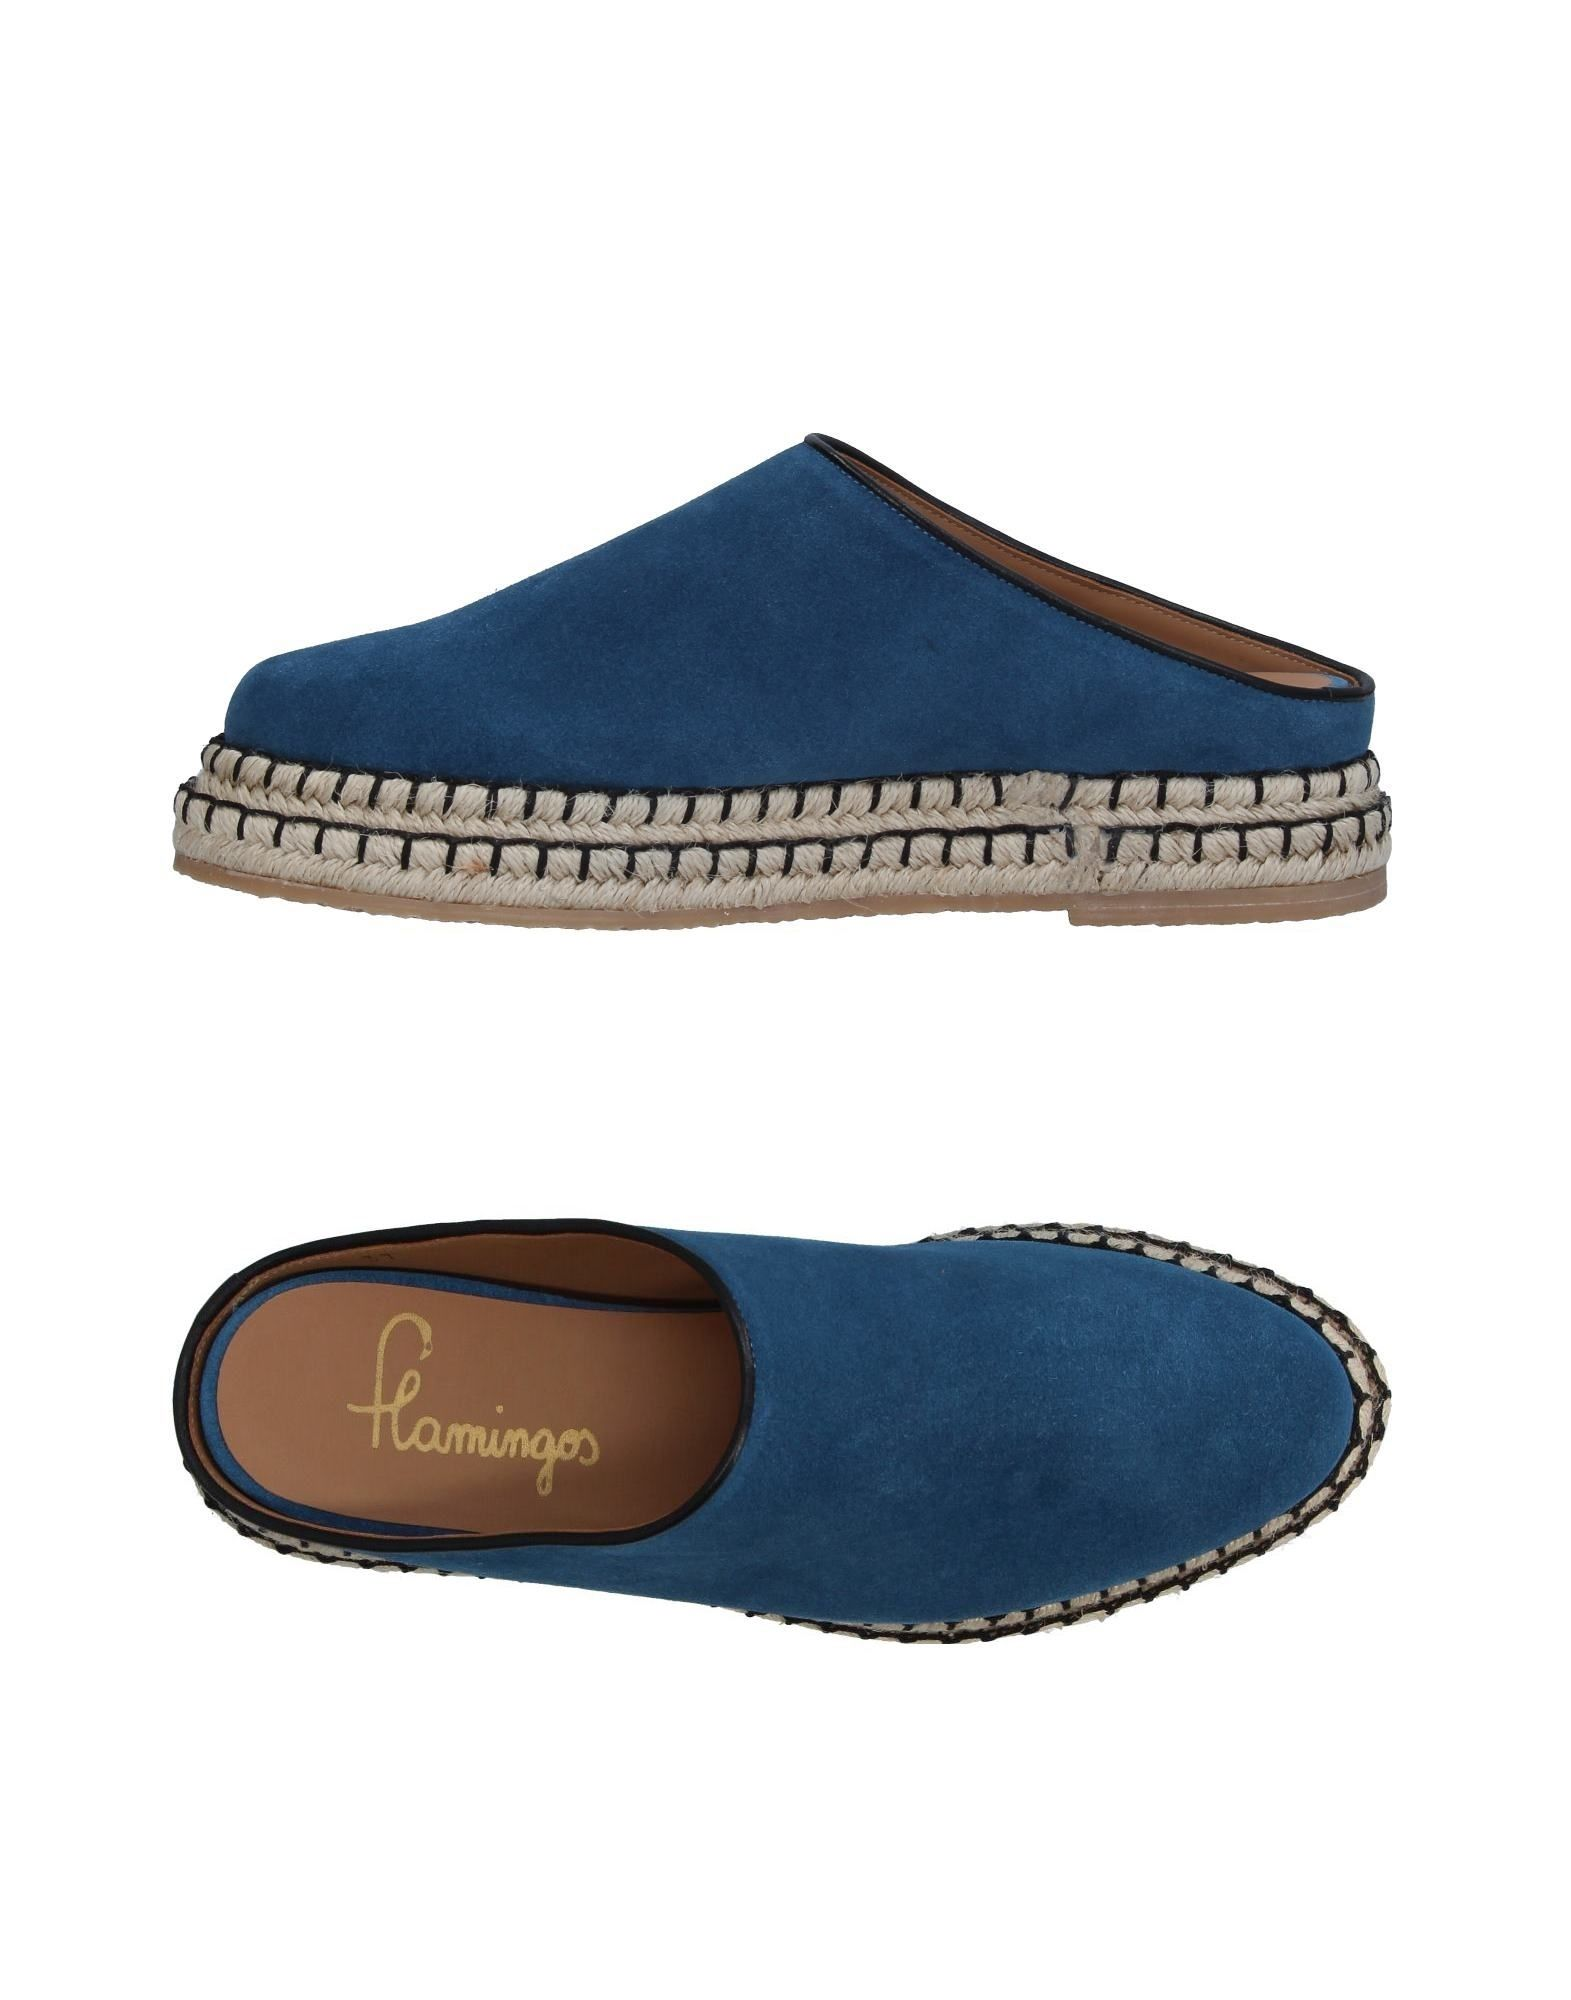 Stilvolle billige Schuhe Flamingos Pantoletten Damen  11343620FX